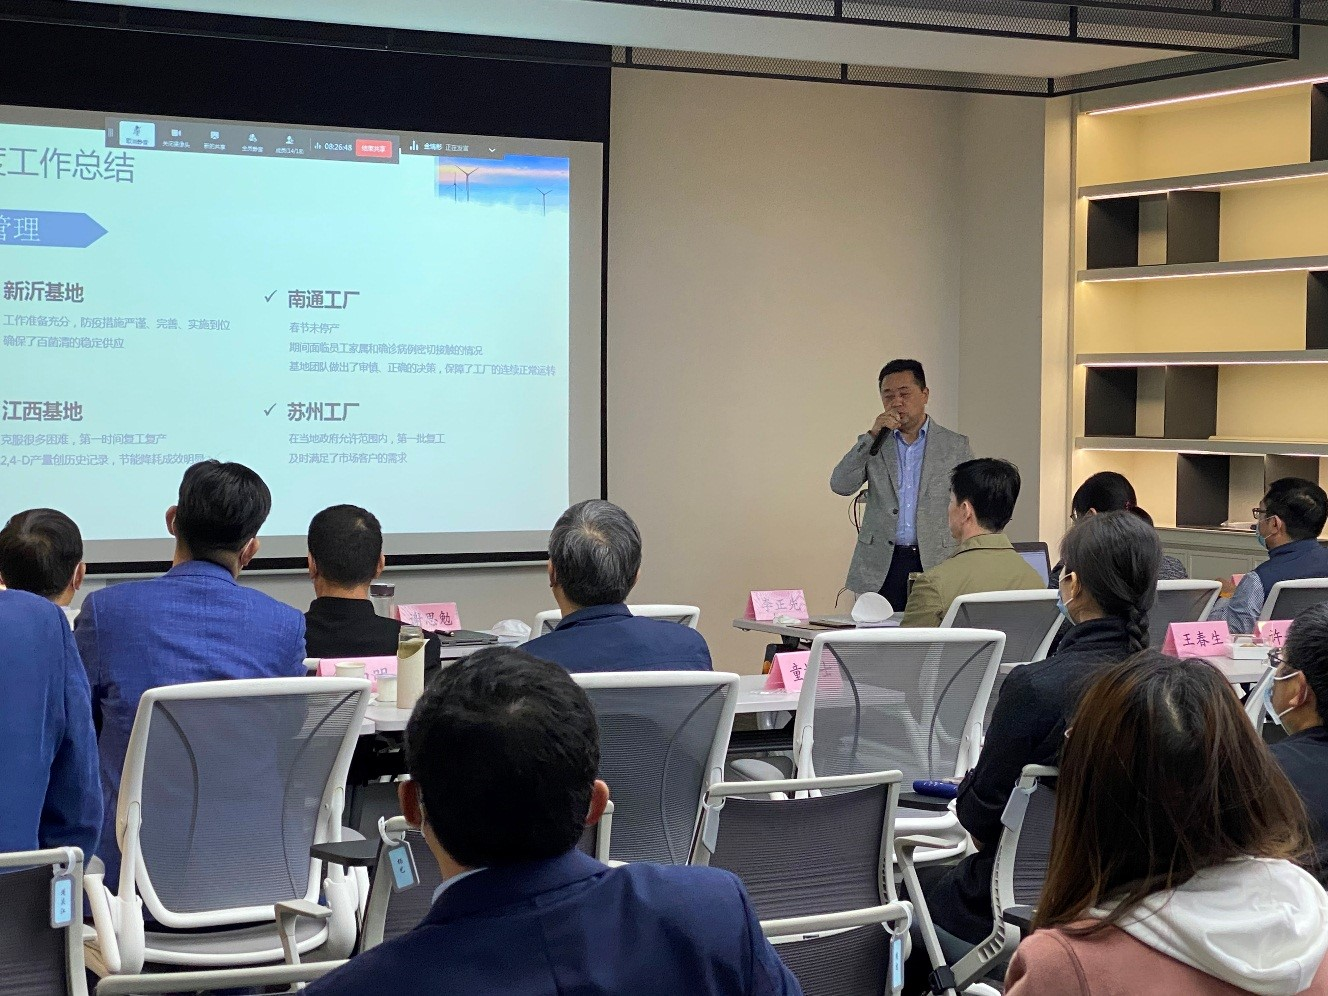 bwin登录平台下载国际一季度经营会议线上召开